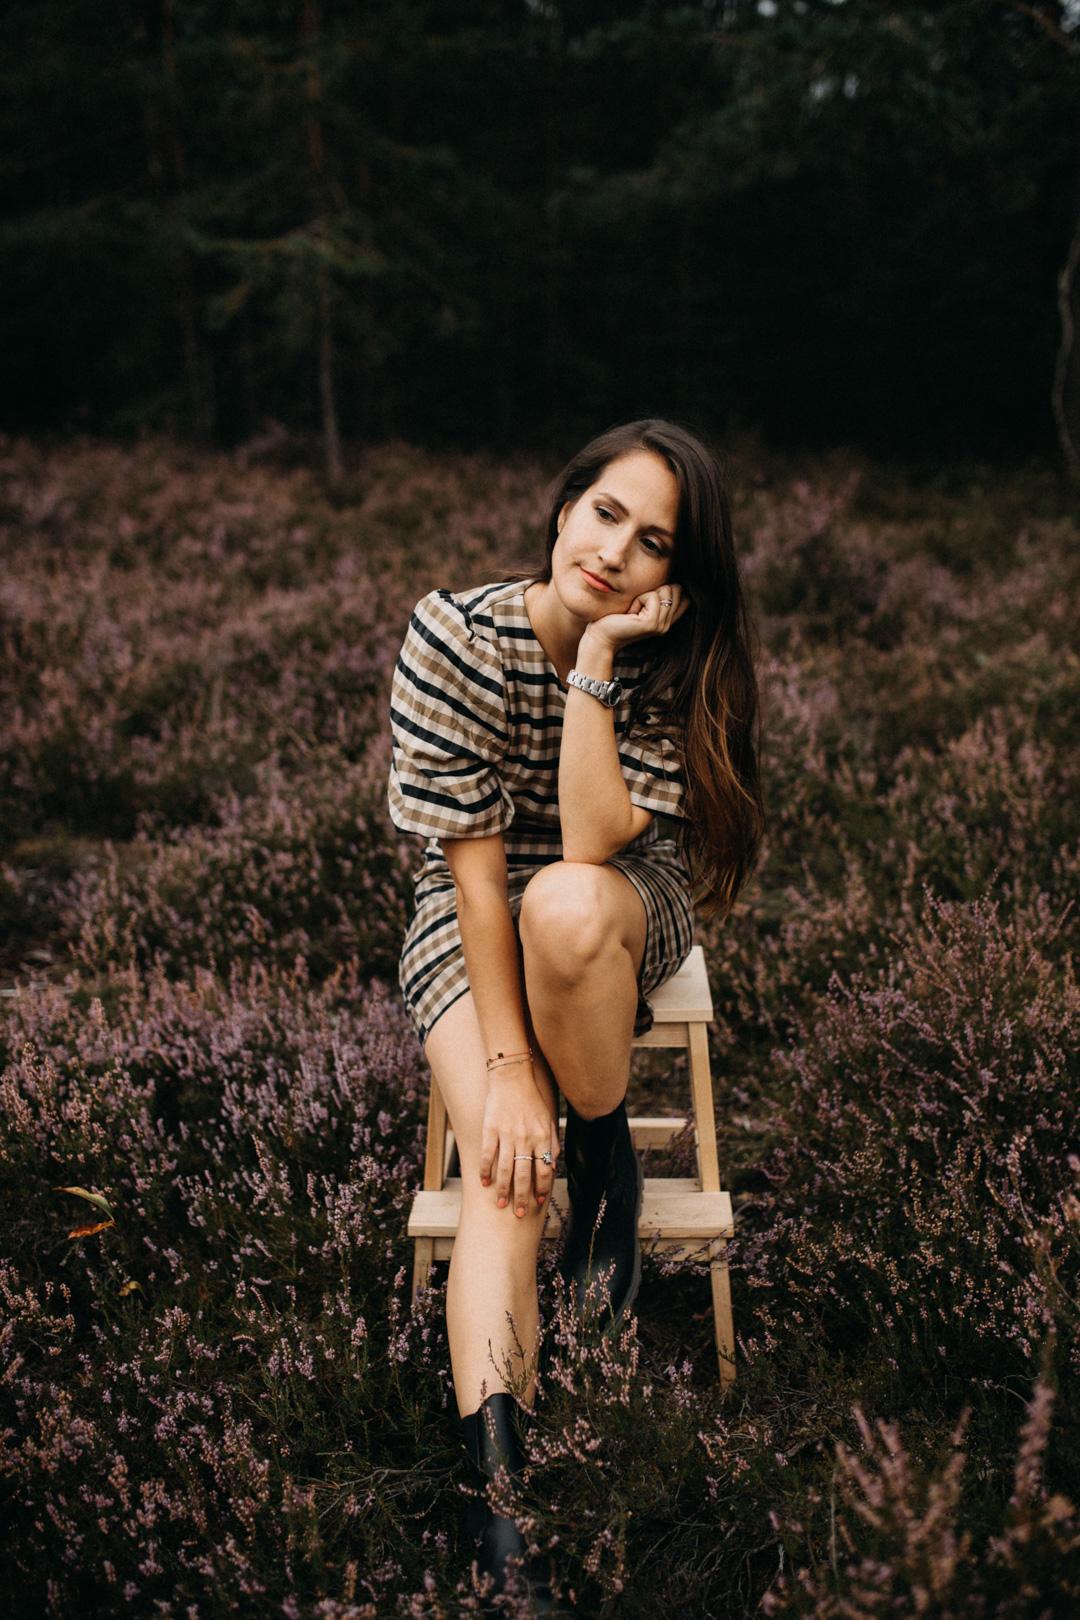 Herbstshooting, Outdoor Shooting mit Foto-Hintergrund, Selbstreflexion Corona, Positive Affirmation Corona